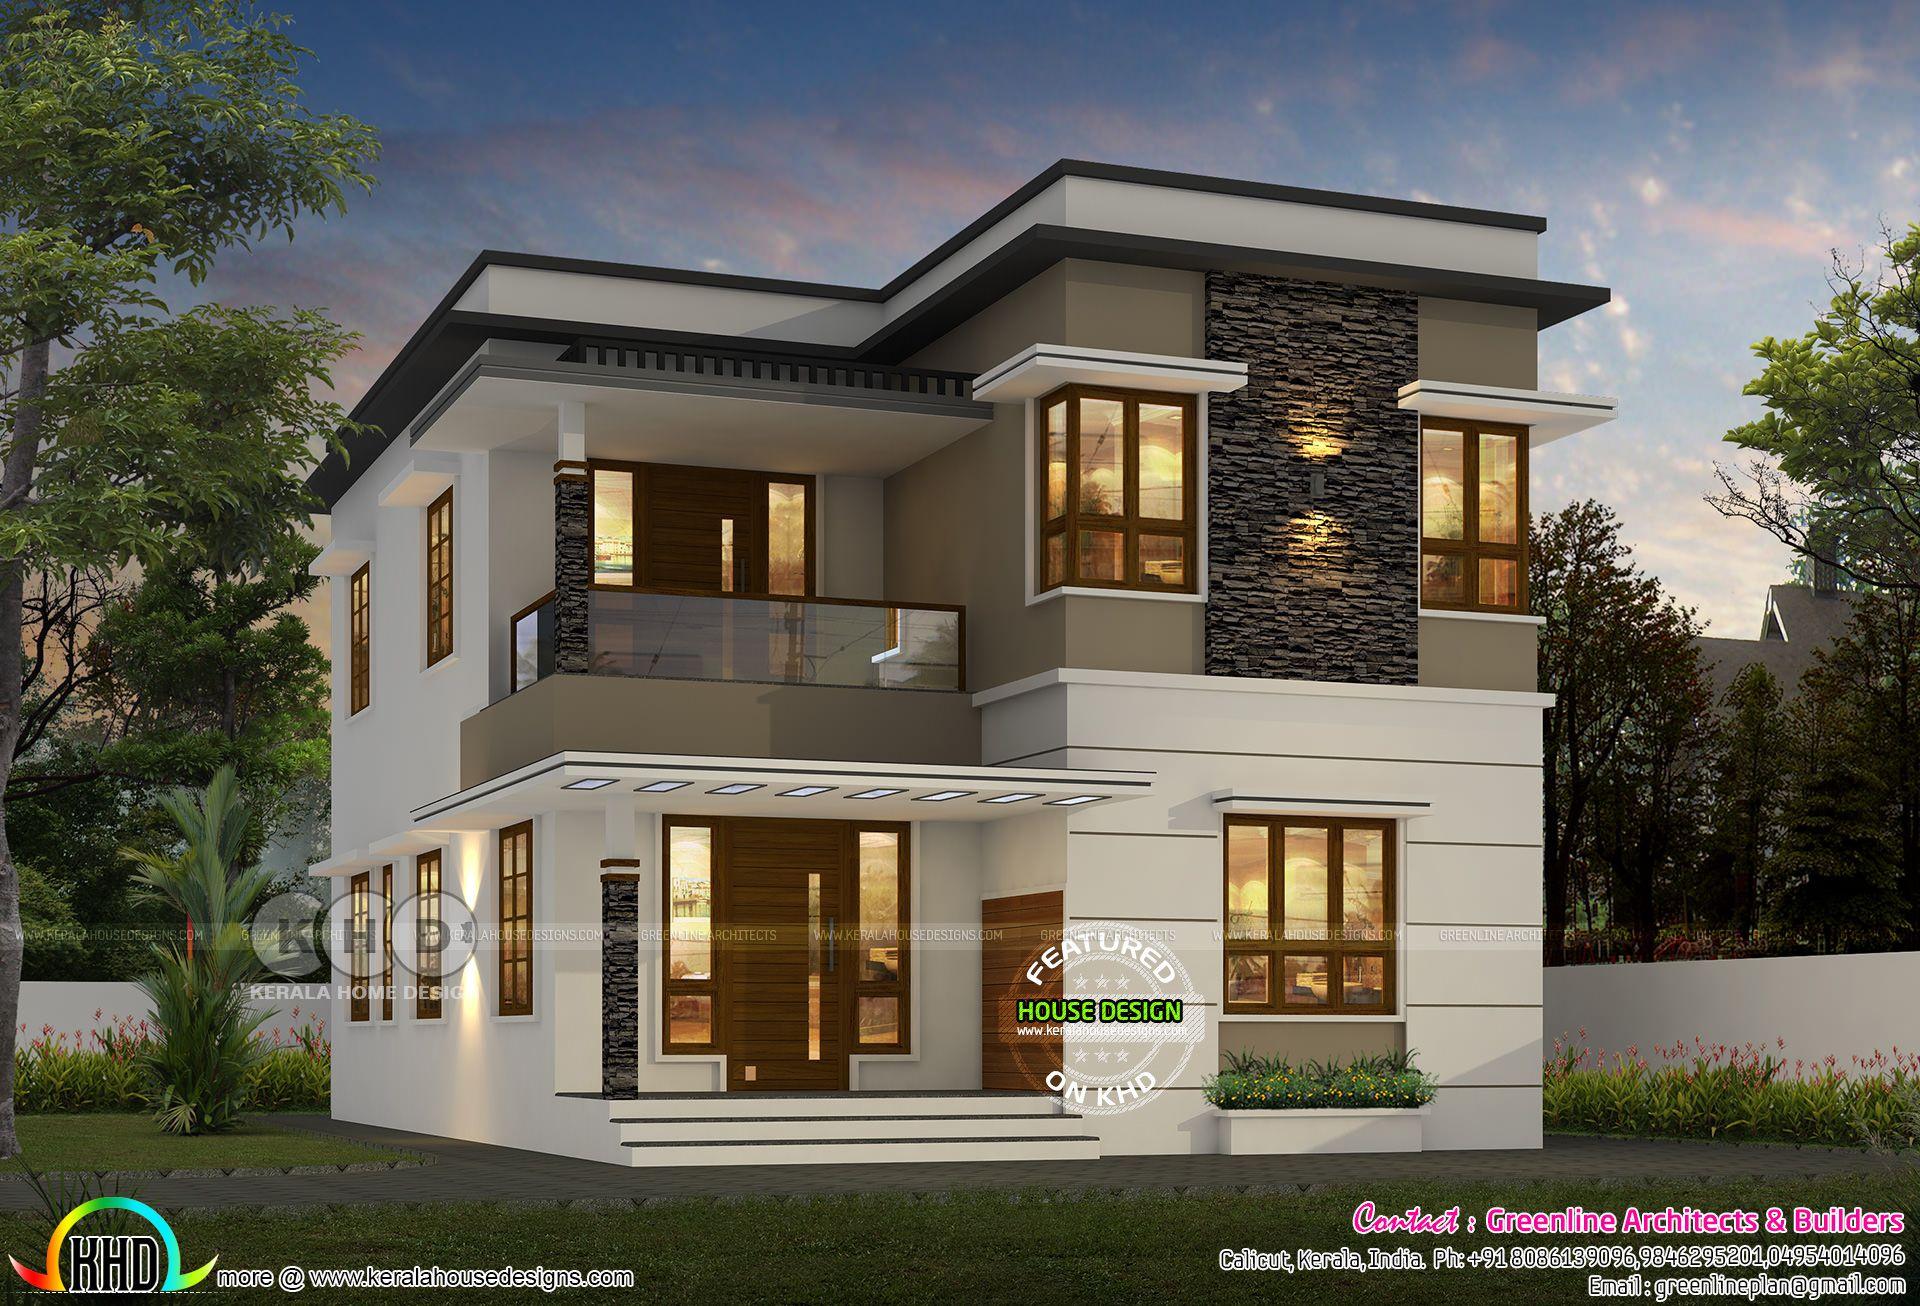 1600 sqft 4 bedroom modern flat roof house Flat roof